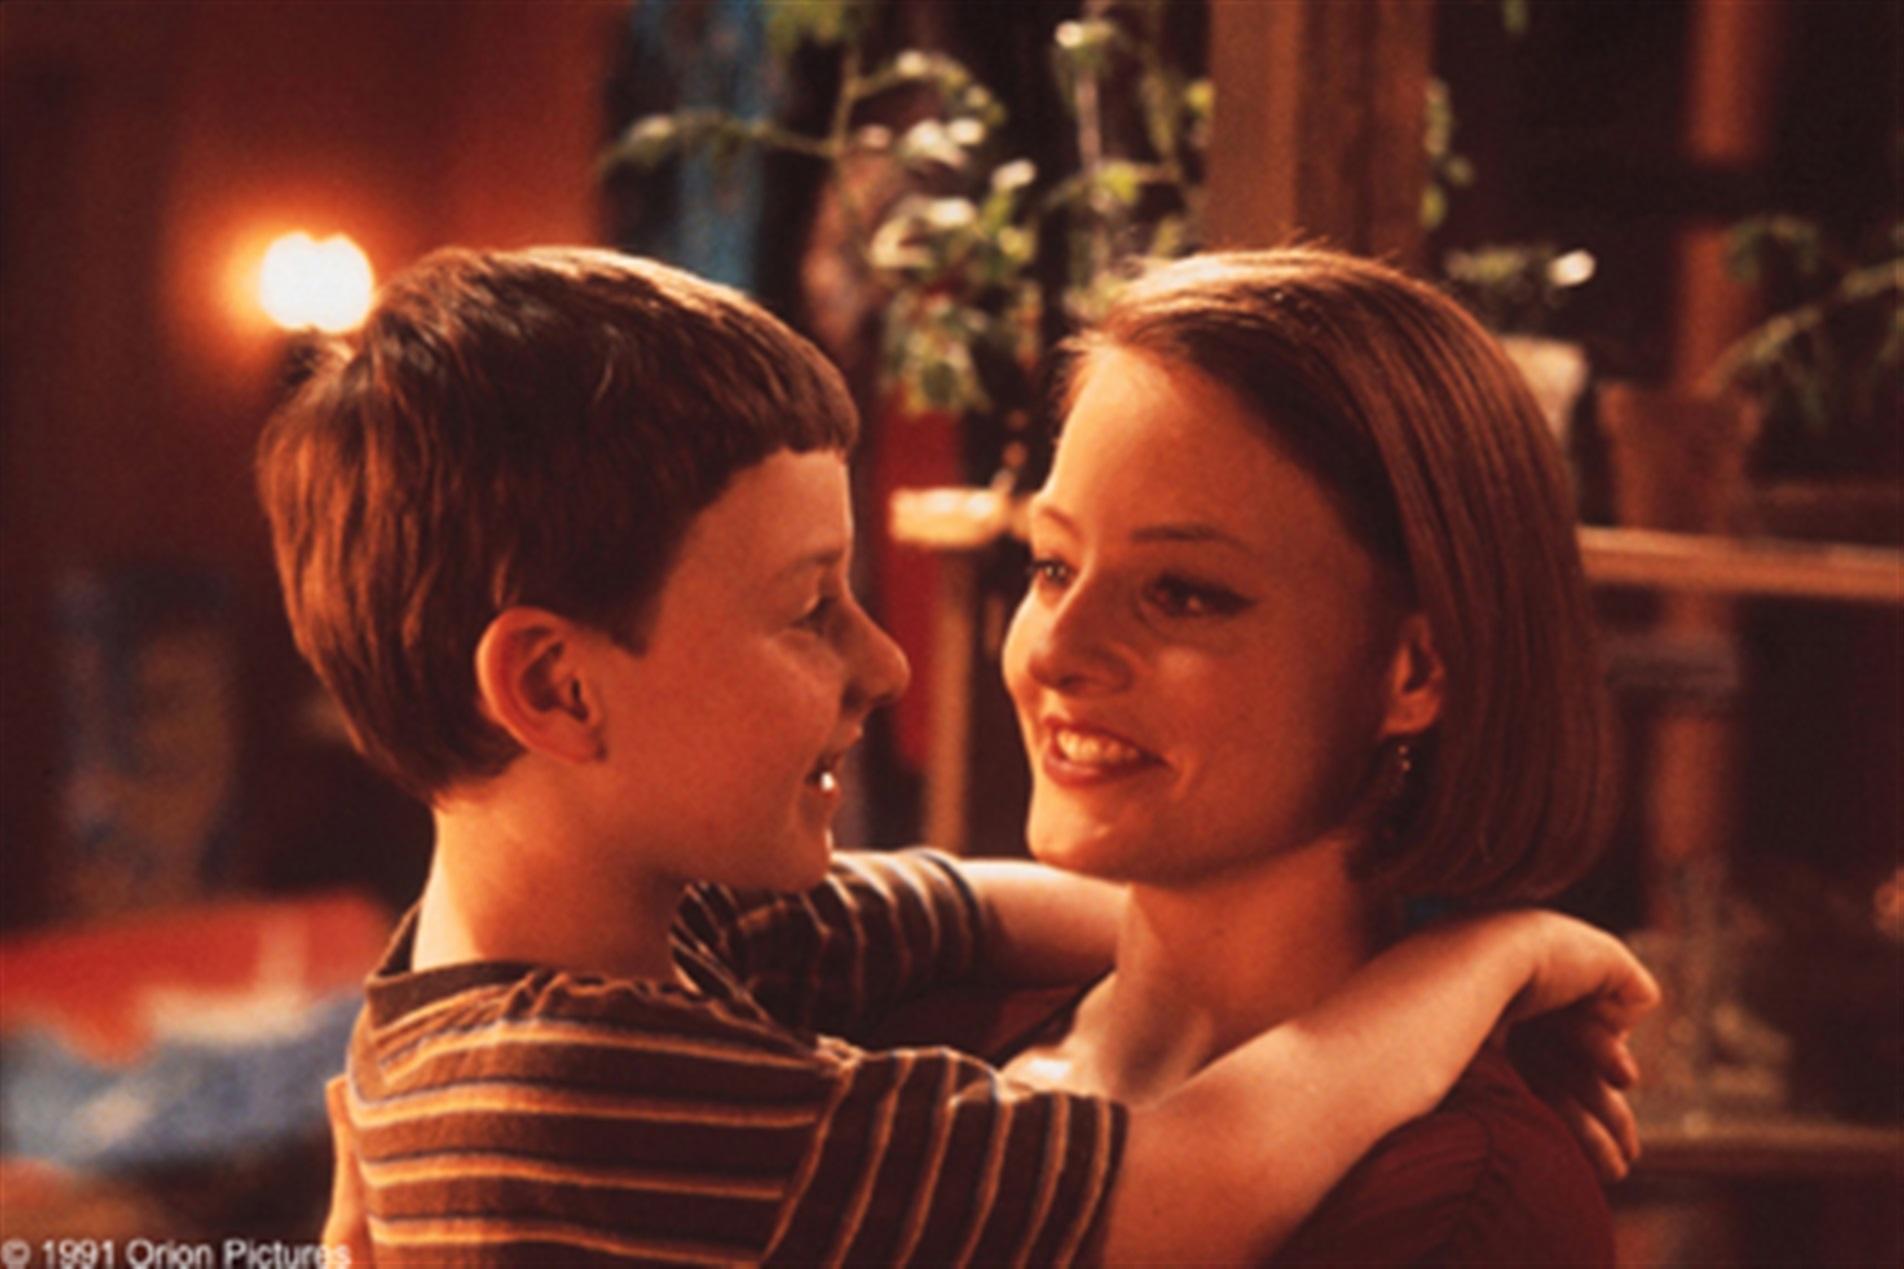 scene from Little Man Tate